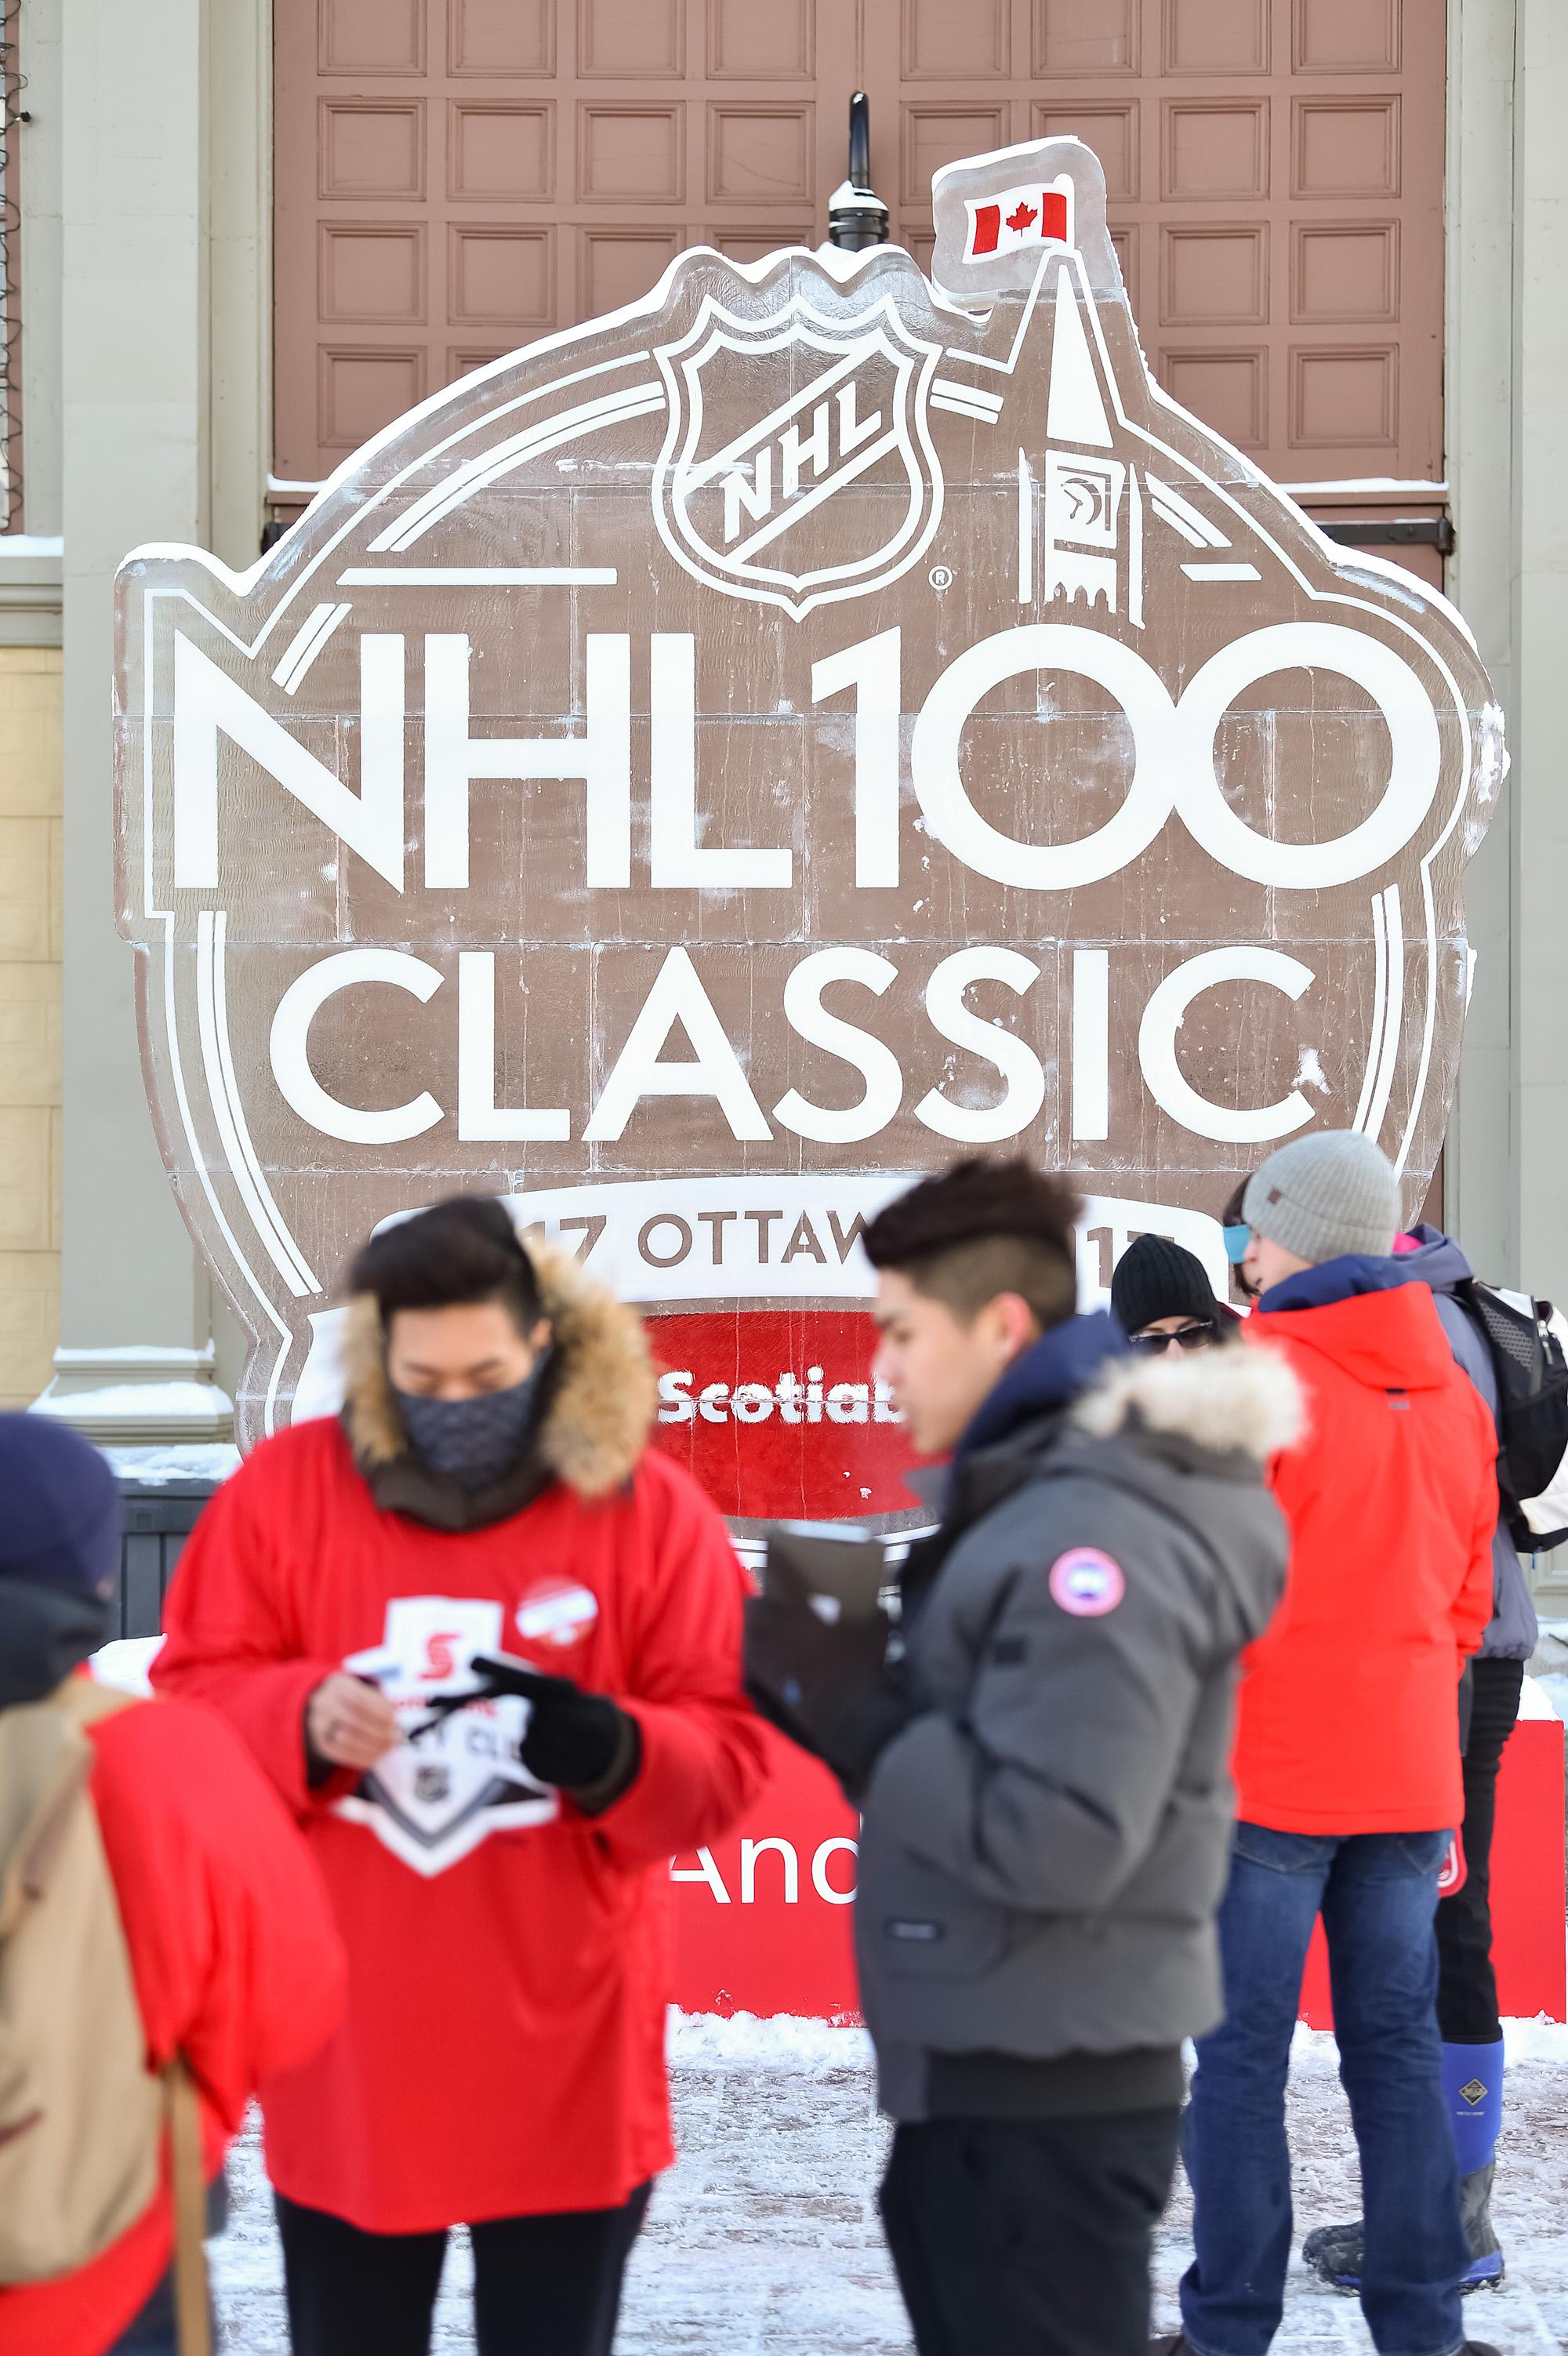 Ottawa_NHL100_Design_3.jpg